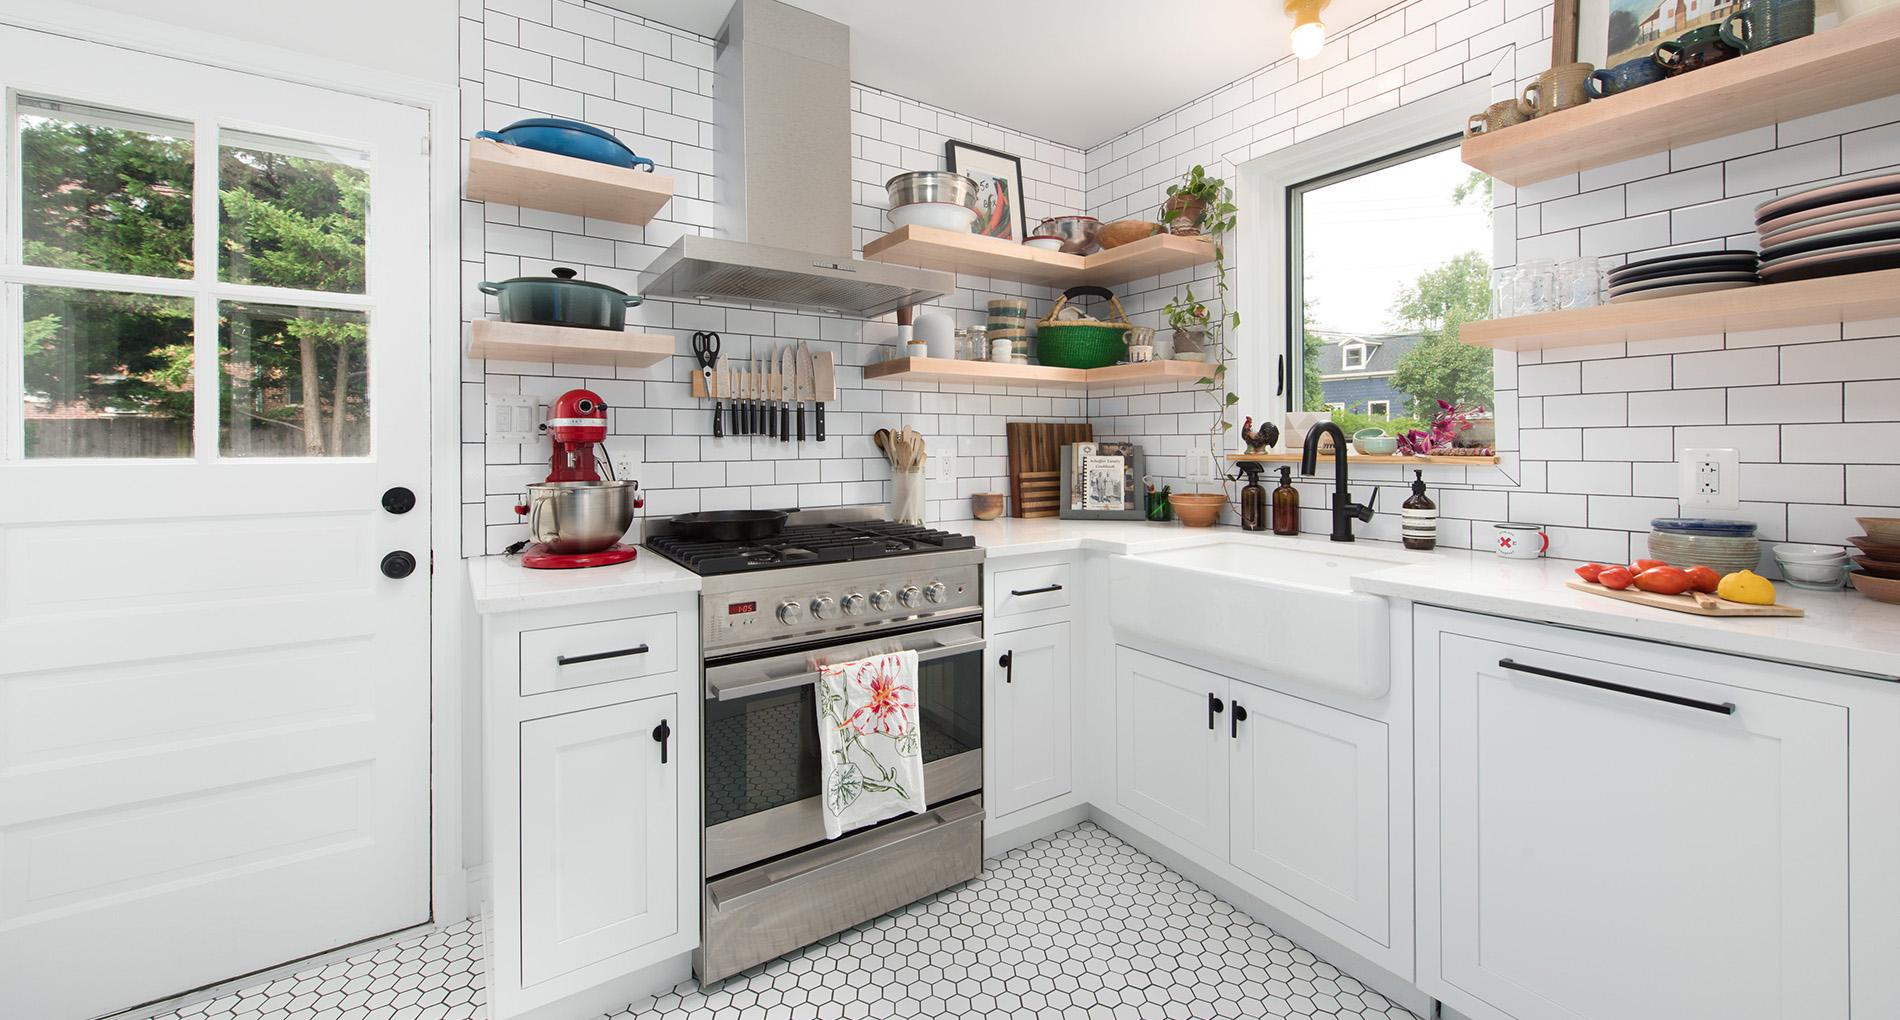 N Oxford Kitchen Remodel